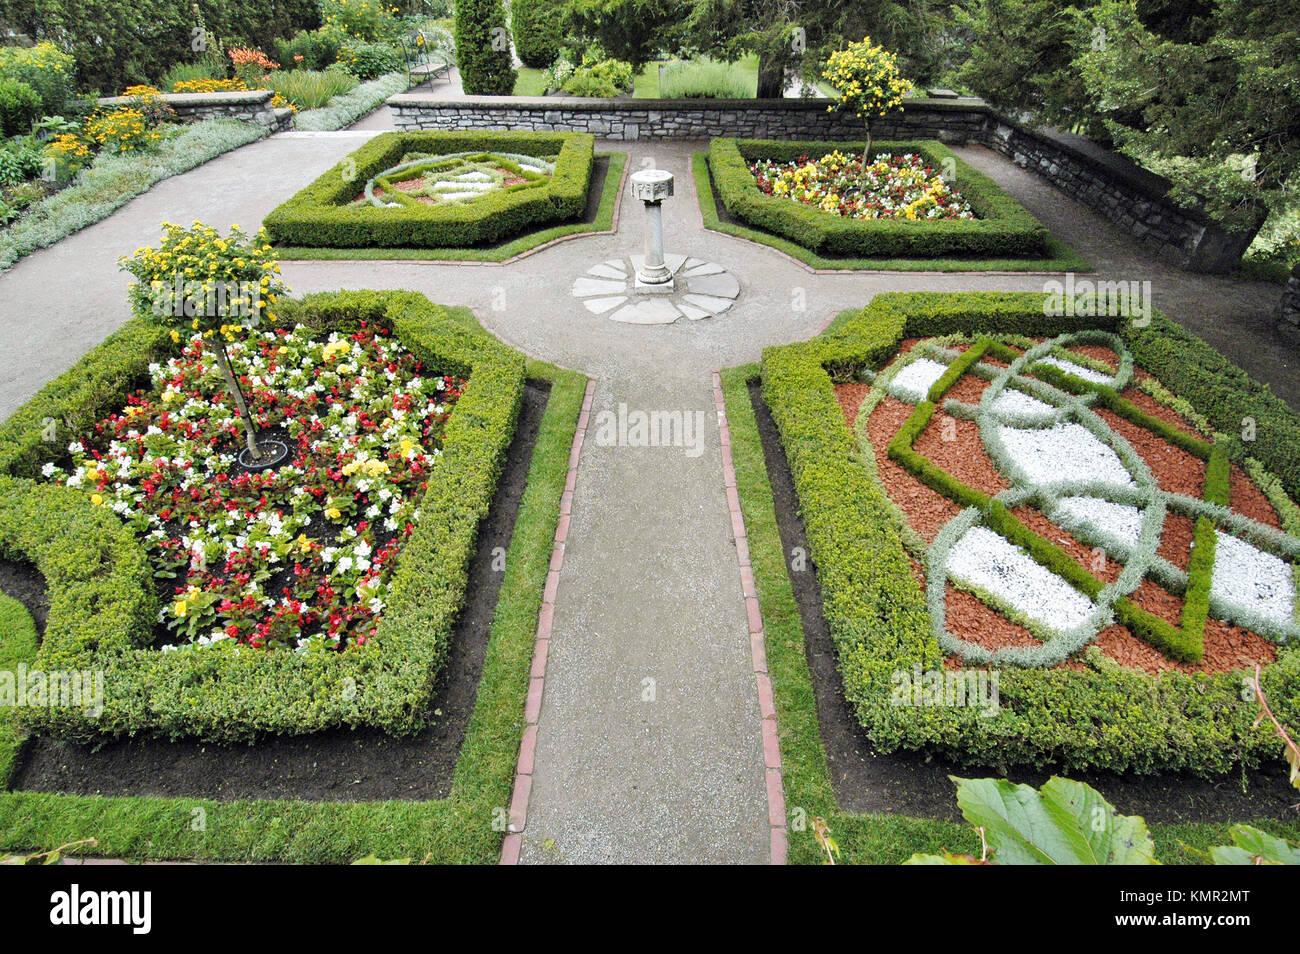 Shakespearean Gardens. Stratford. Ontario, Canada - Stock Image